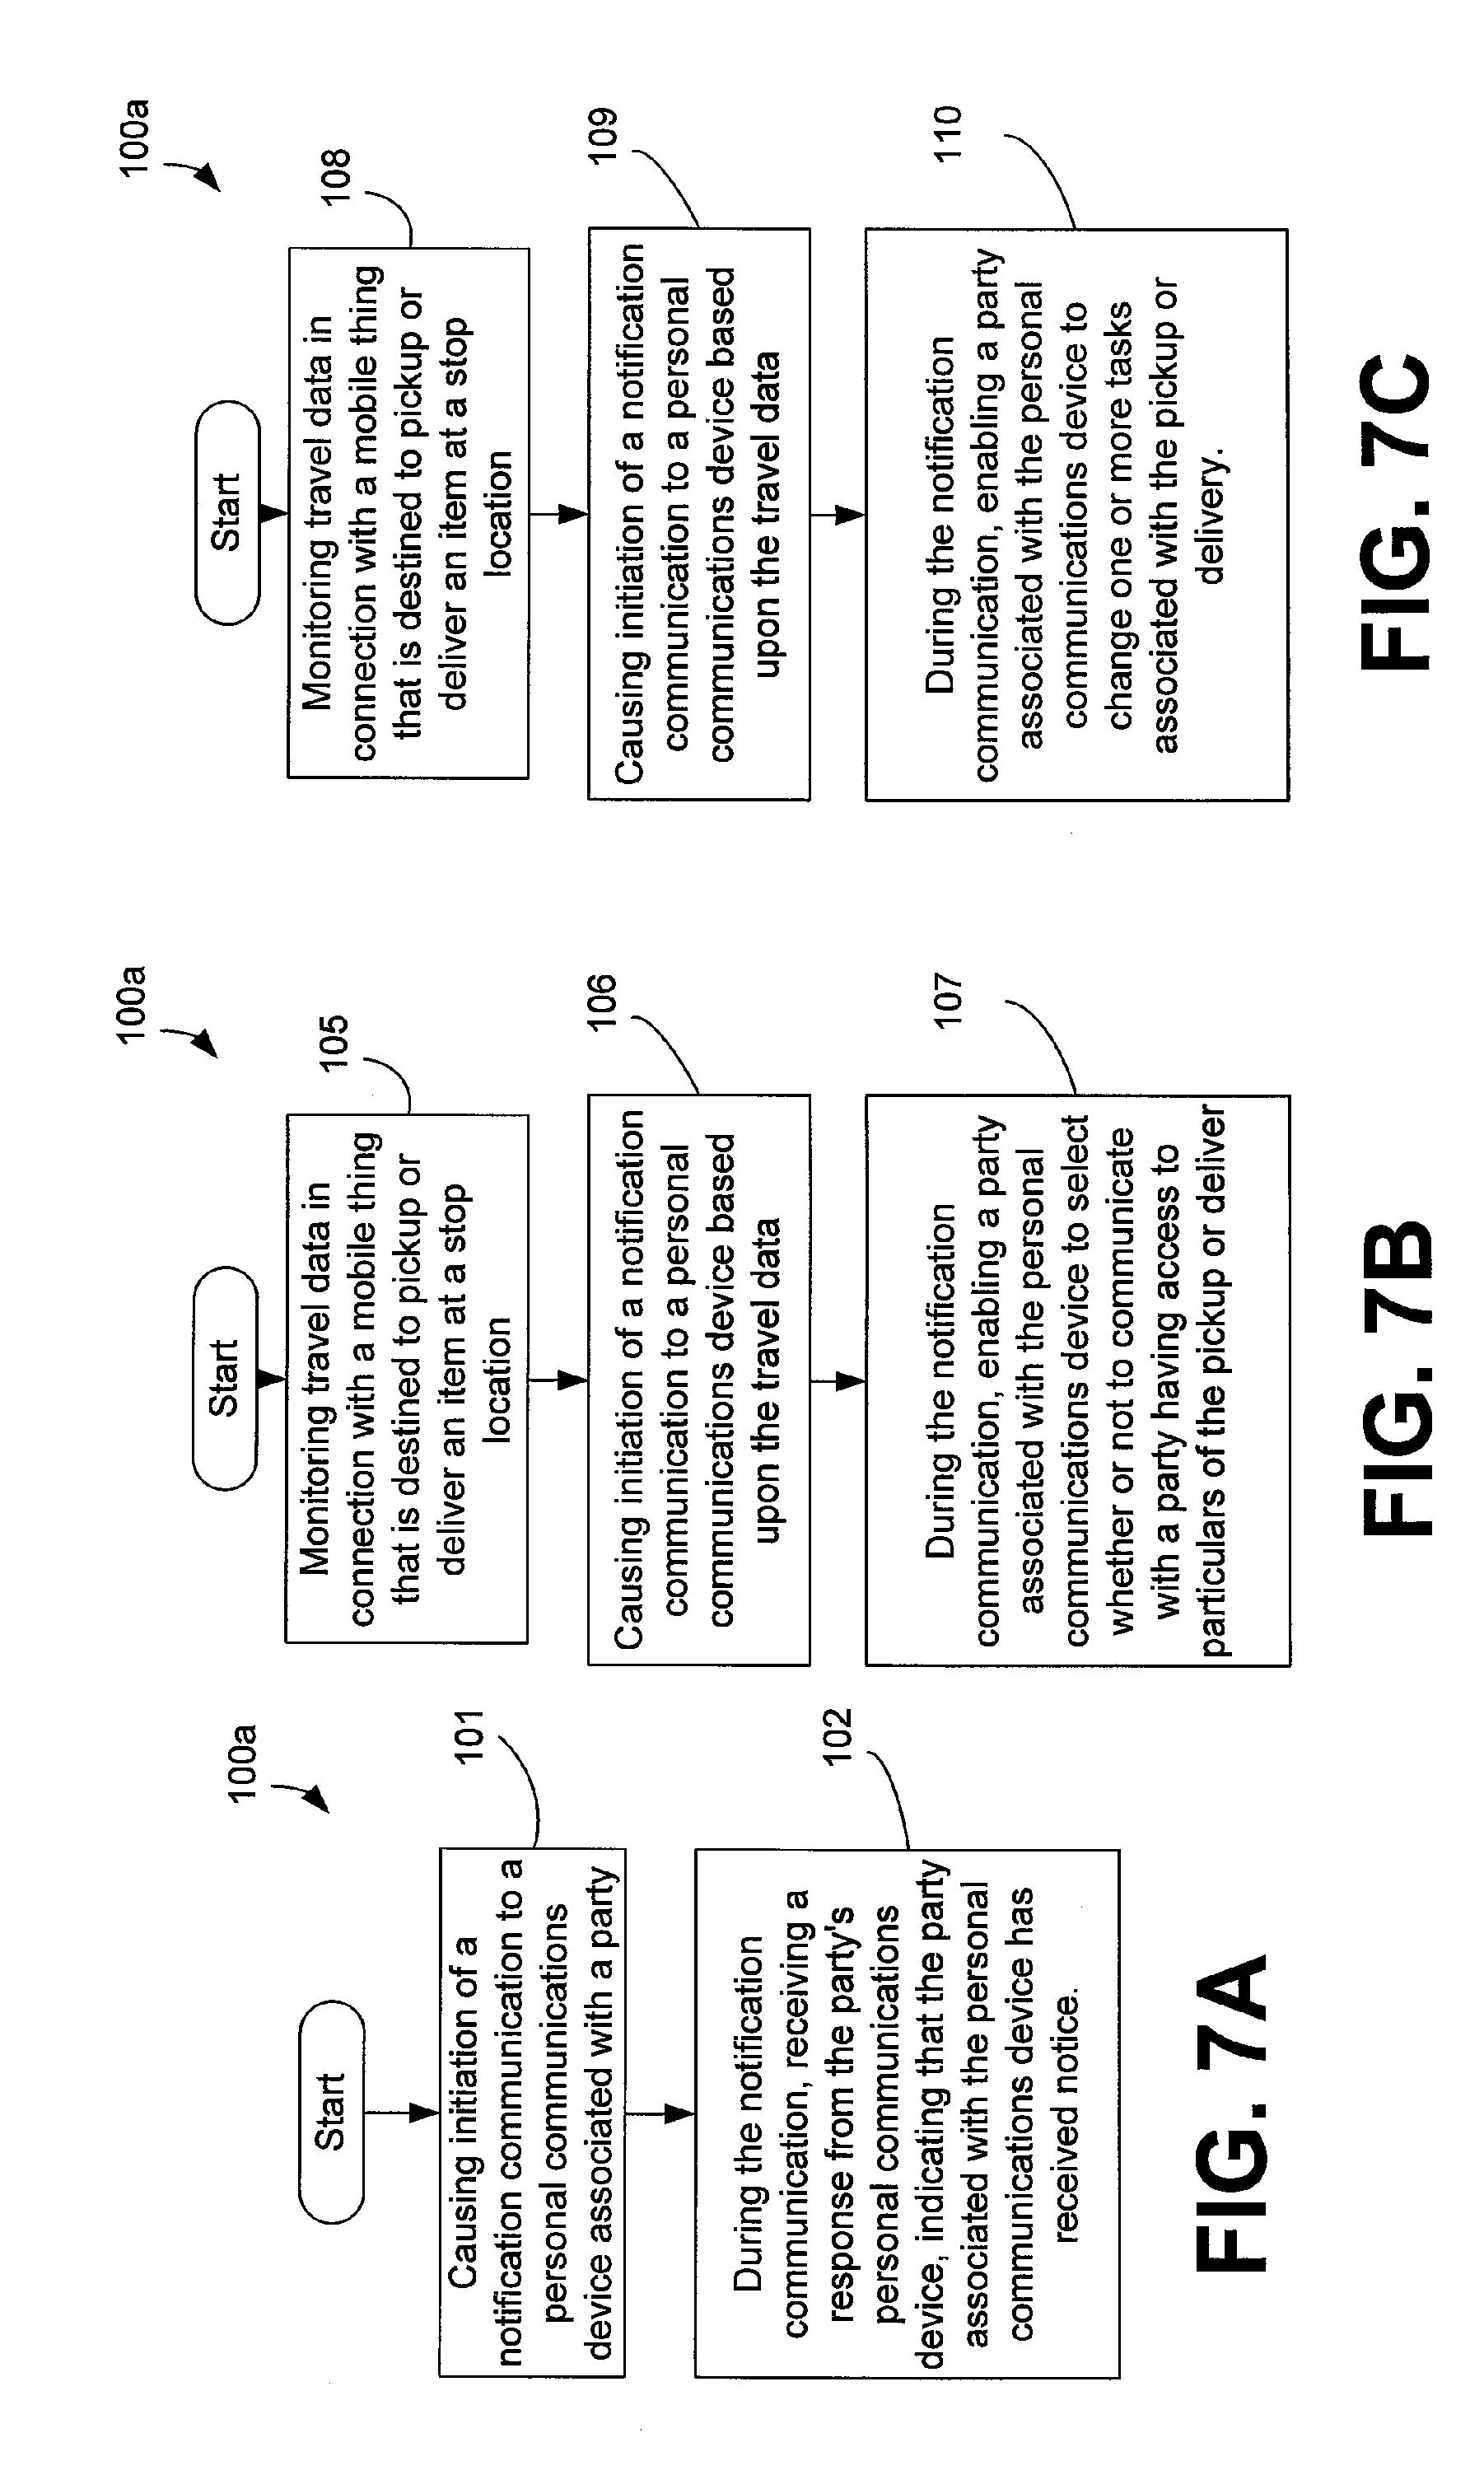 Patent US 7,479,901 B2